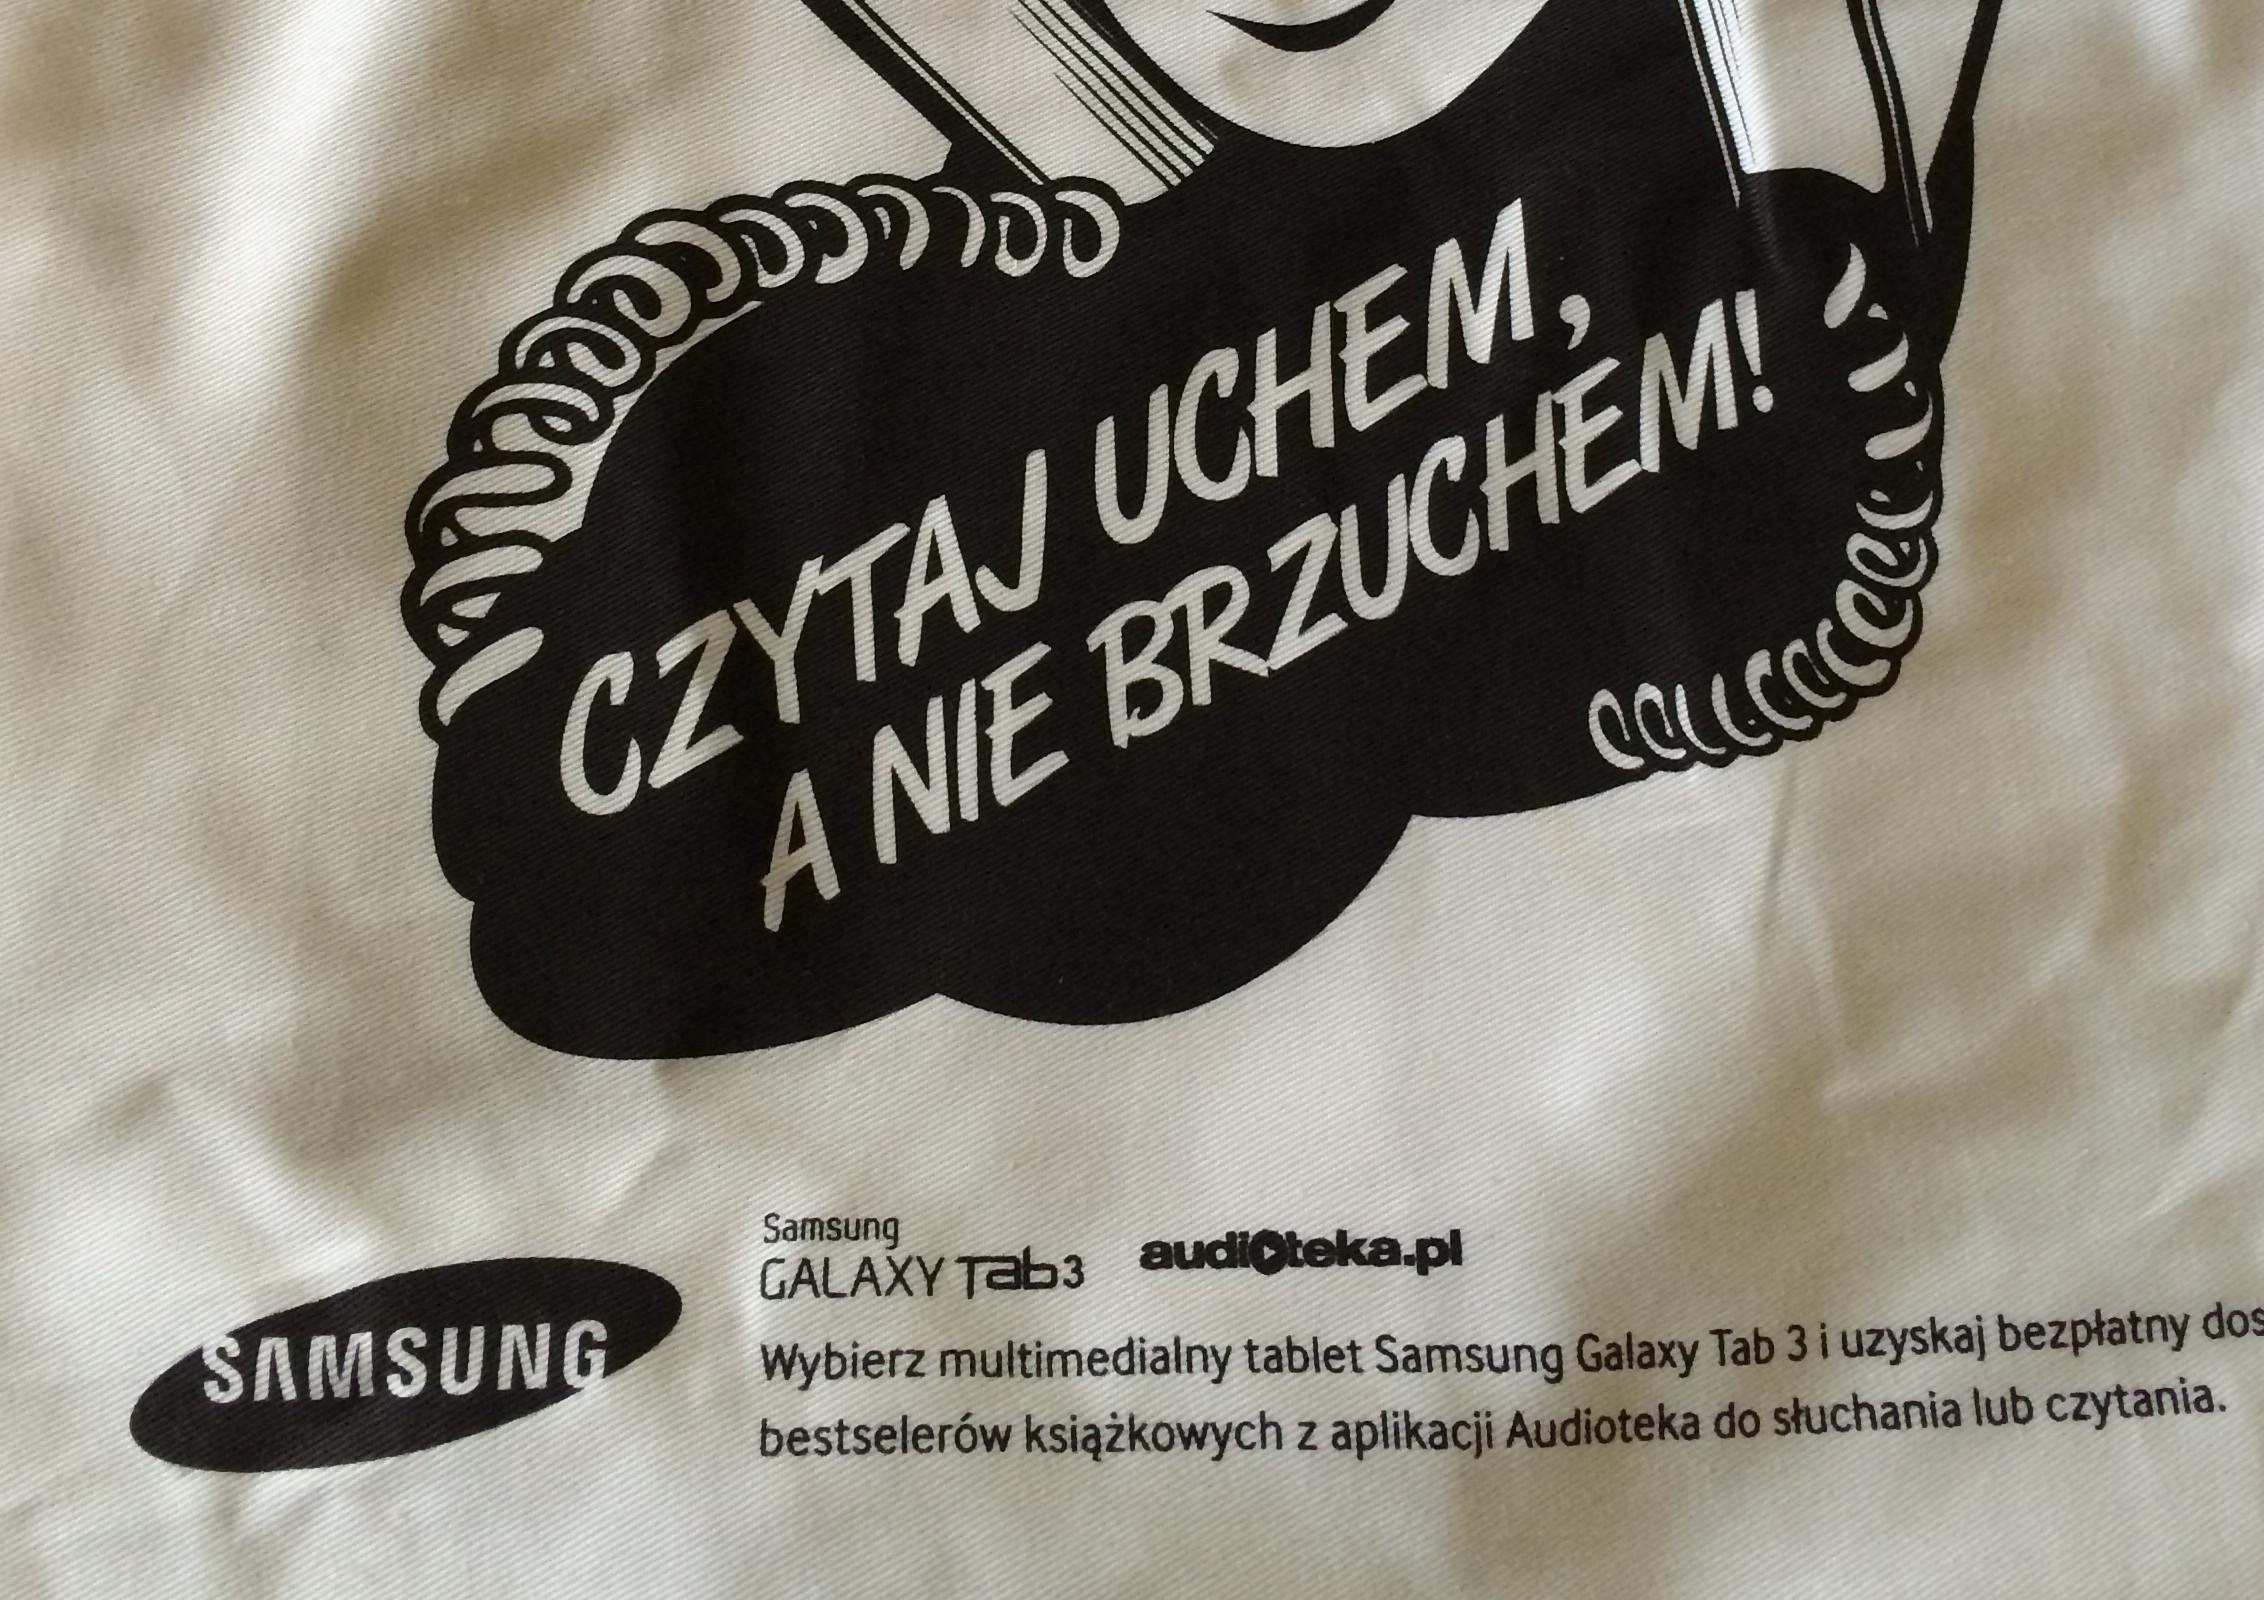 Samsung Audioteka - promocja